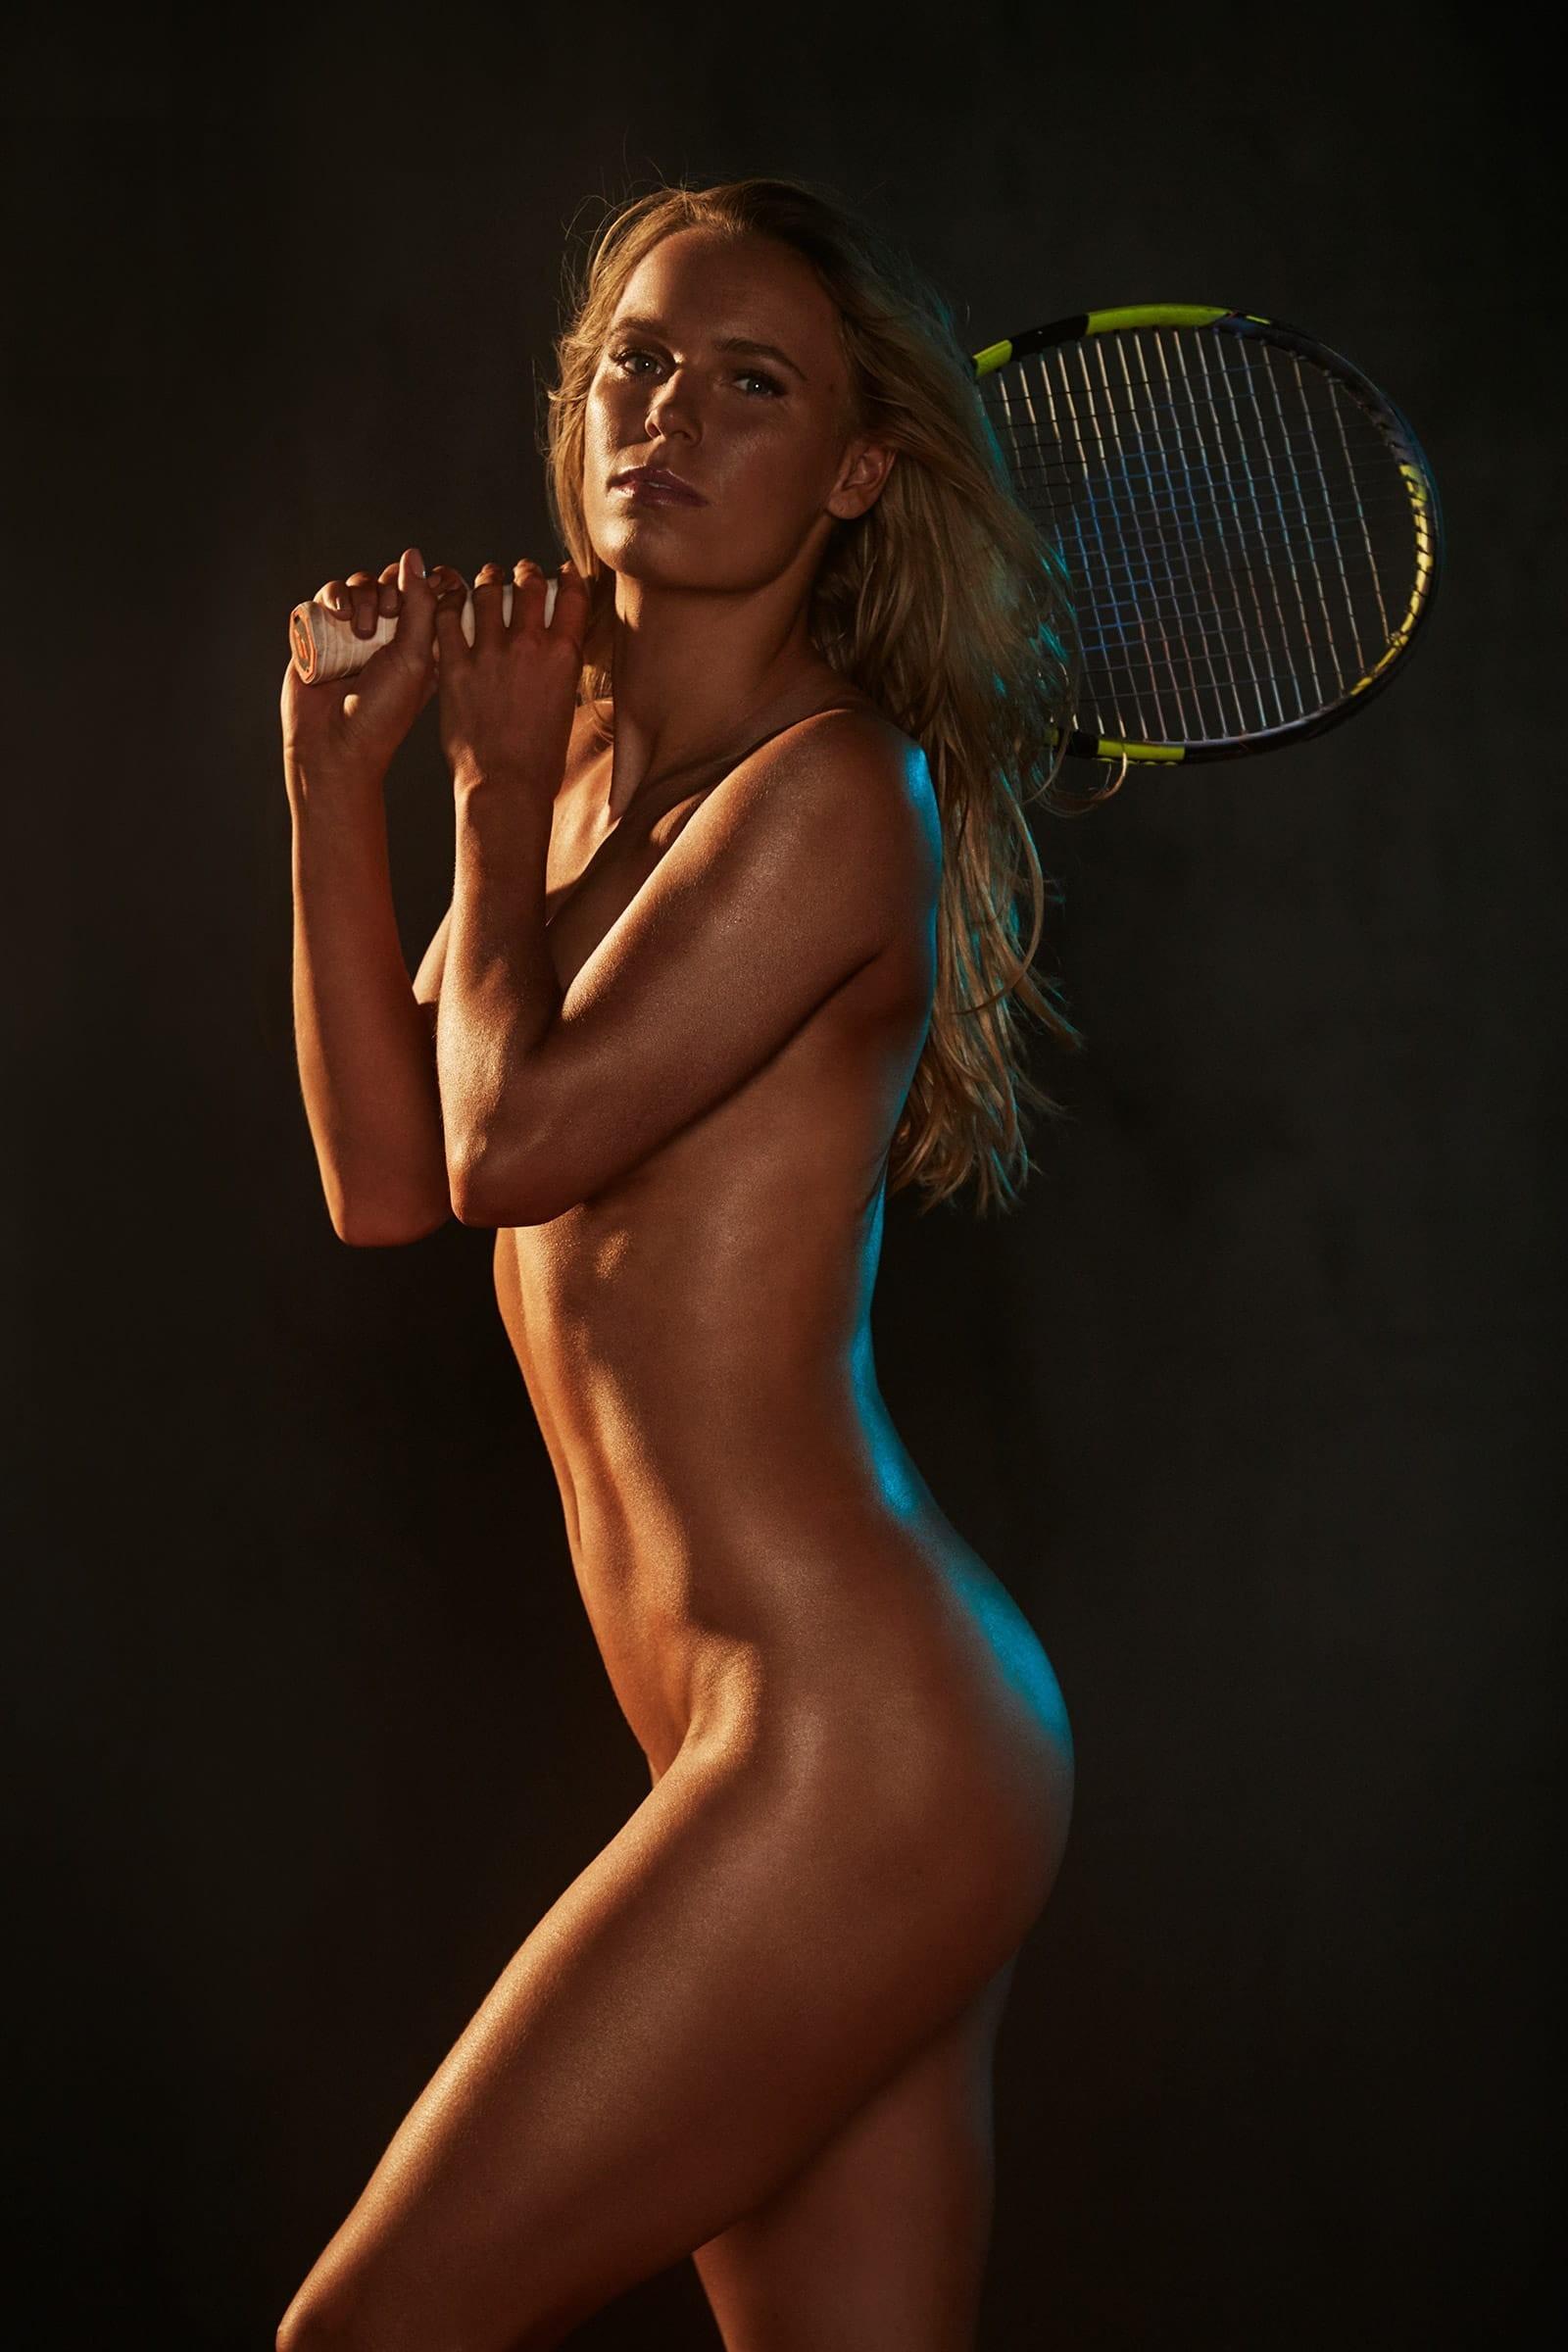 Caroline flack naked topless private pics